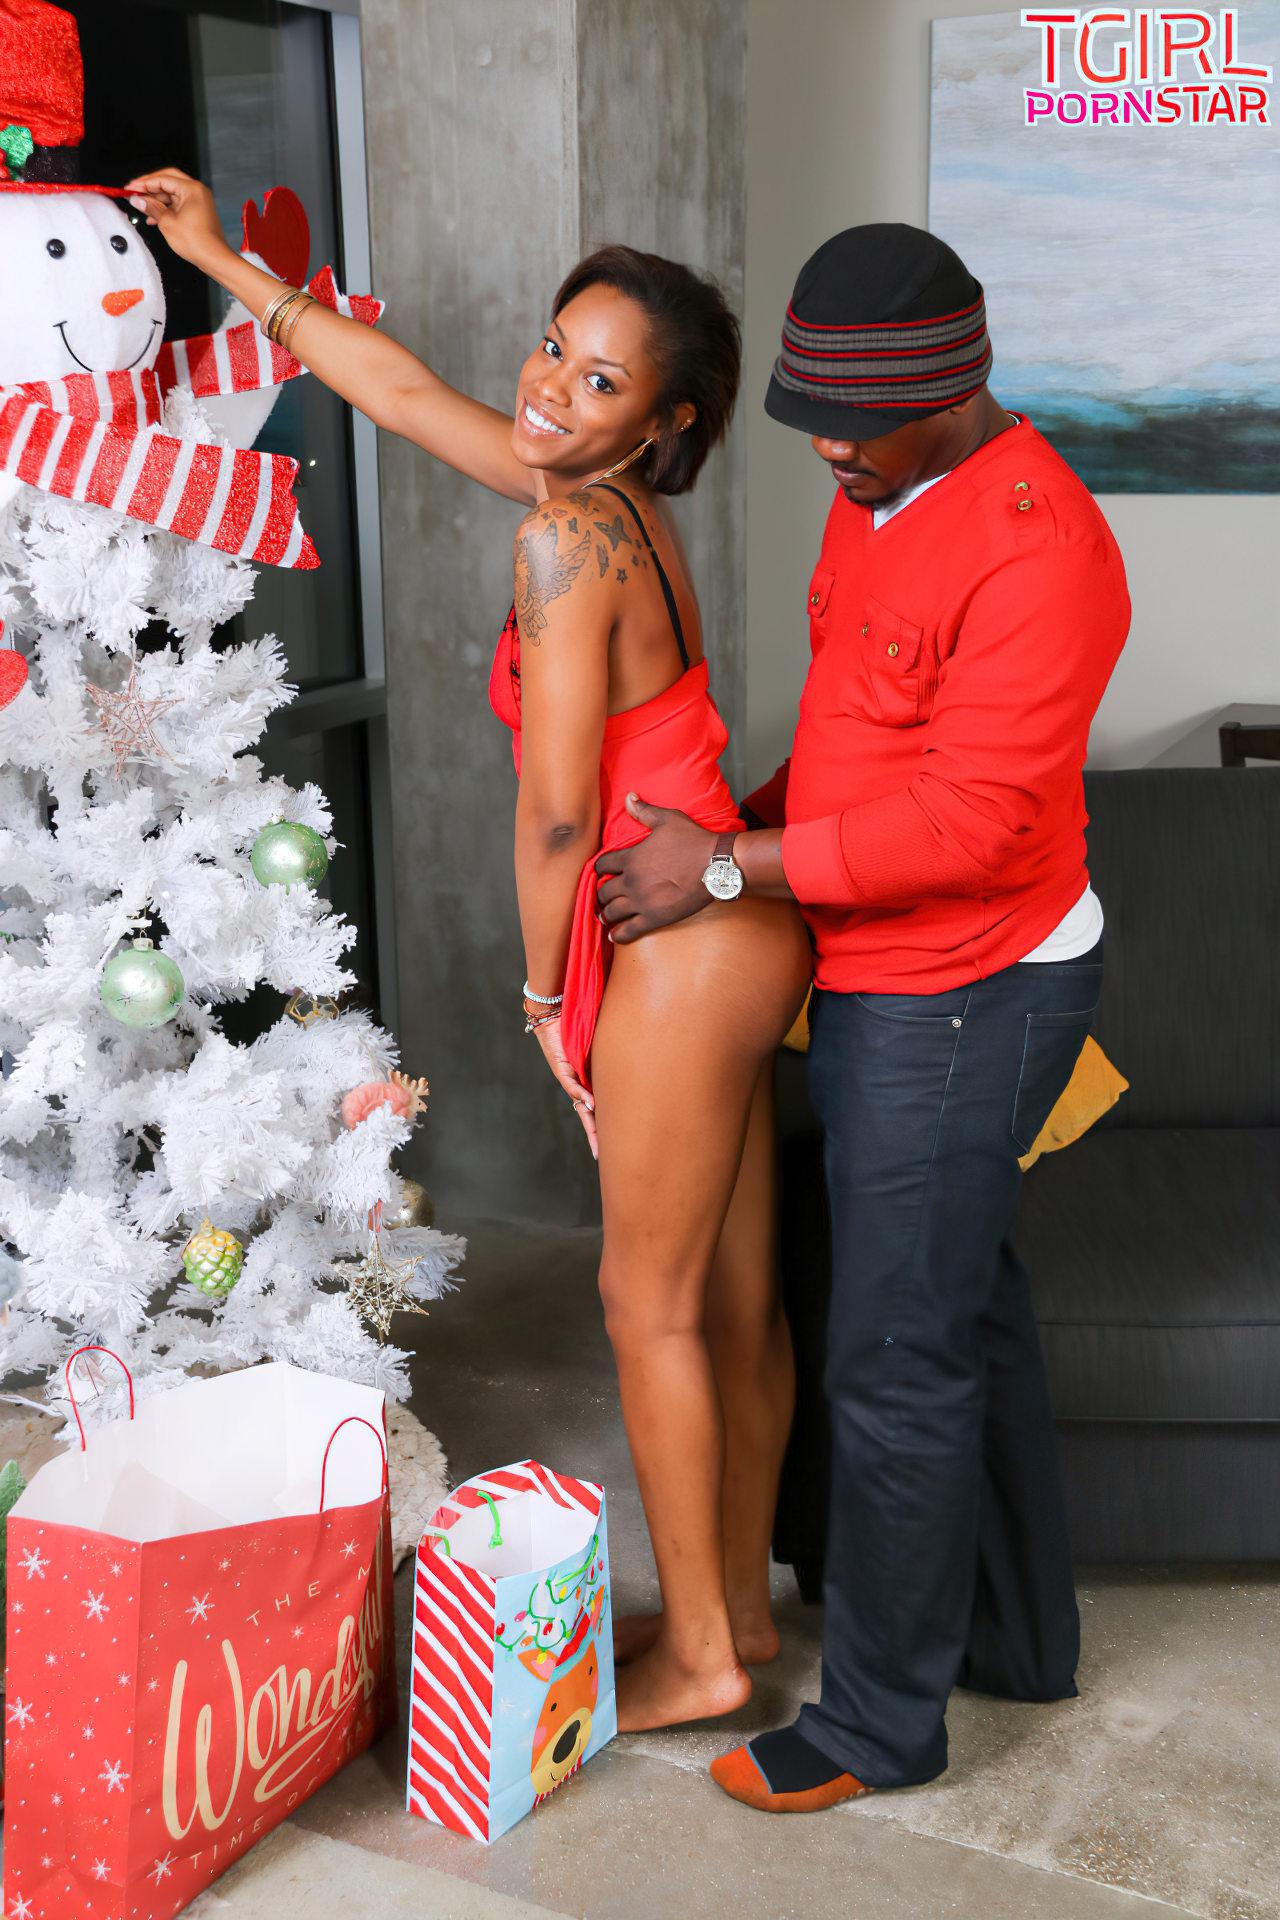 Travesti Negra Fodida no Natal (1)